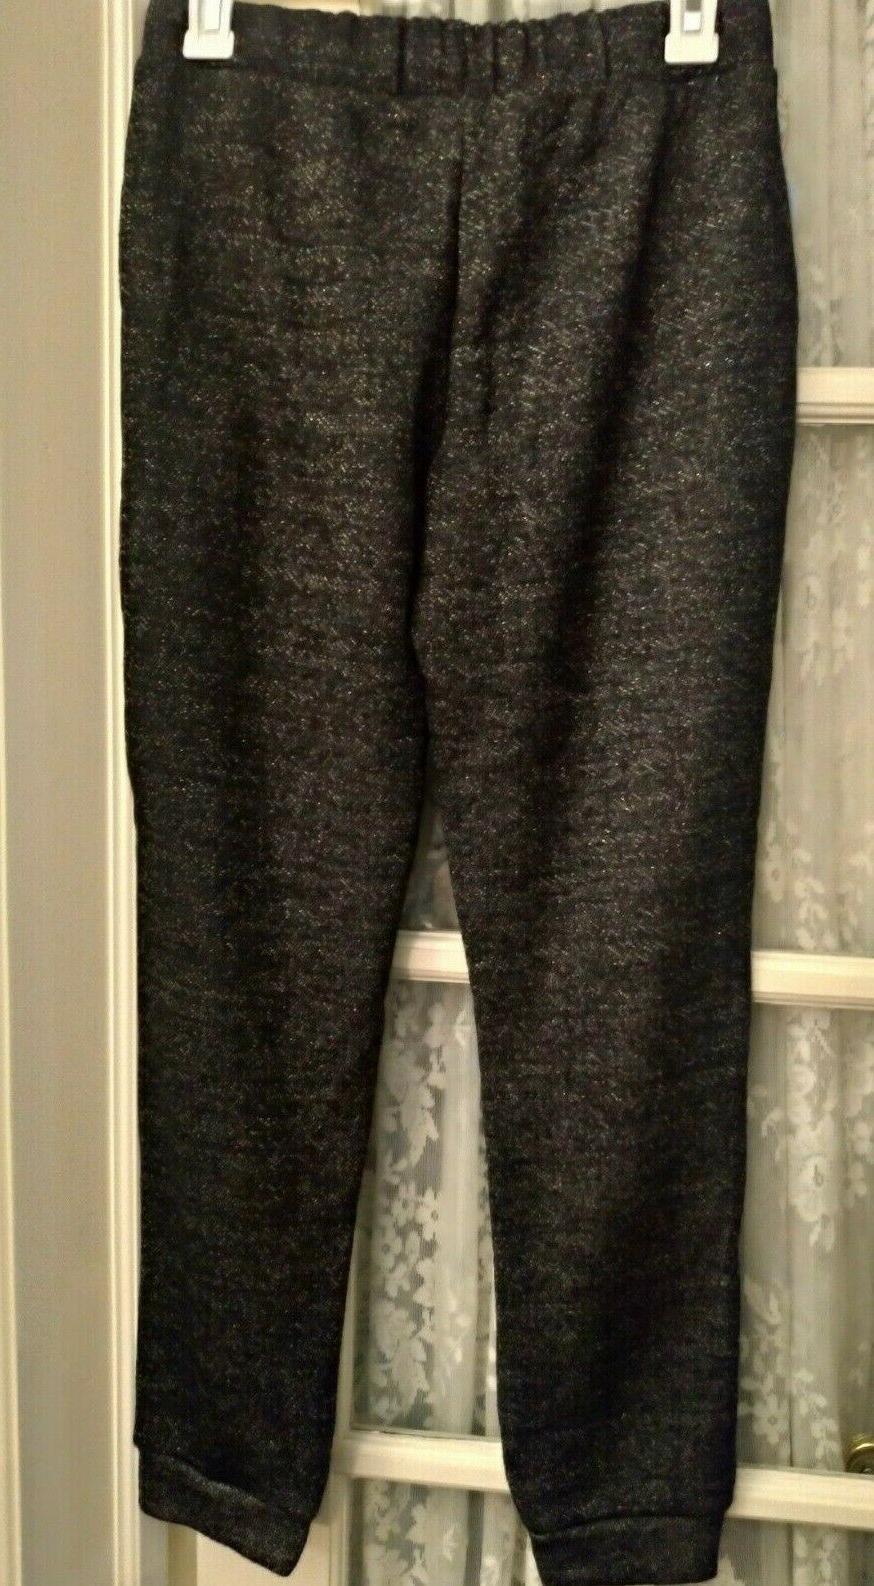 Cat Black XL14/16 Pants Drawstring Pockets Sparkle Glitter